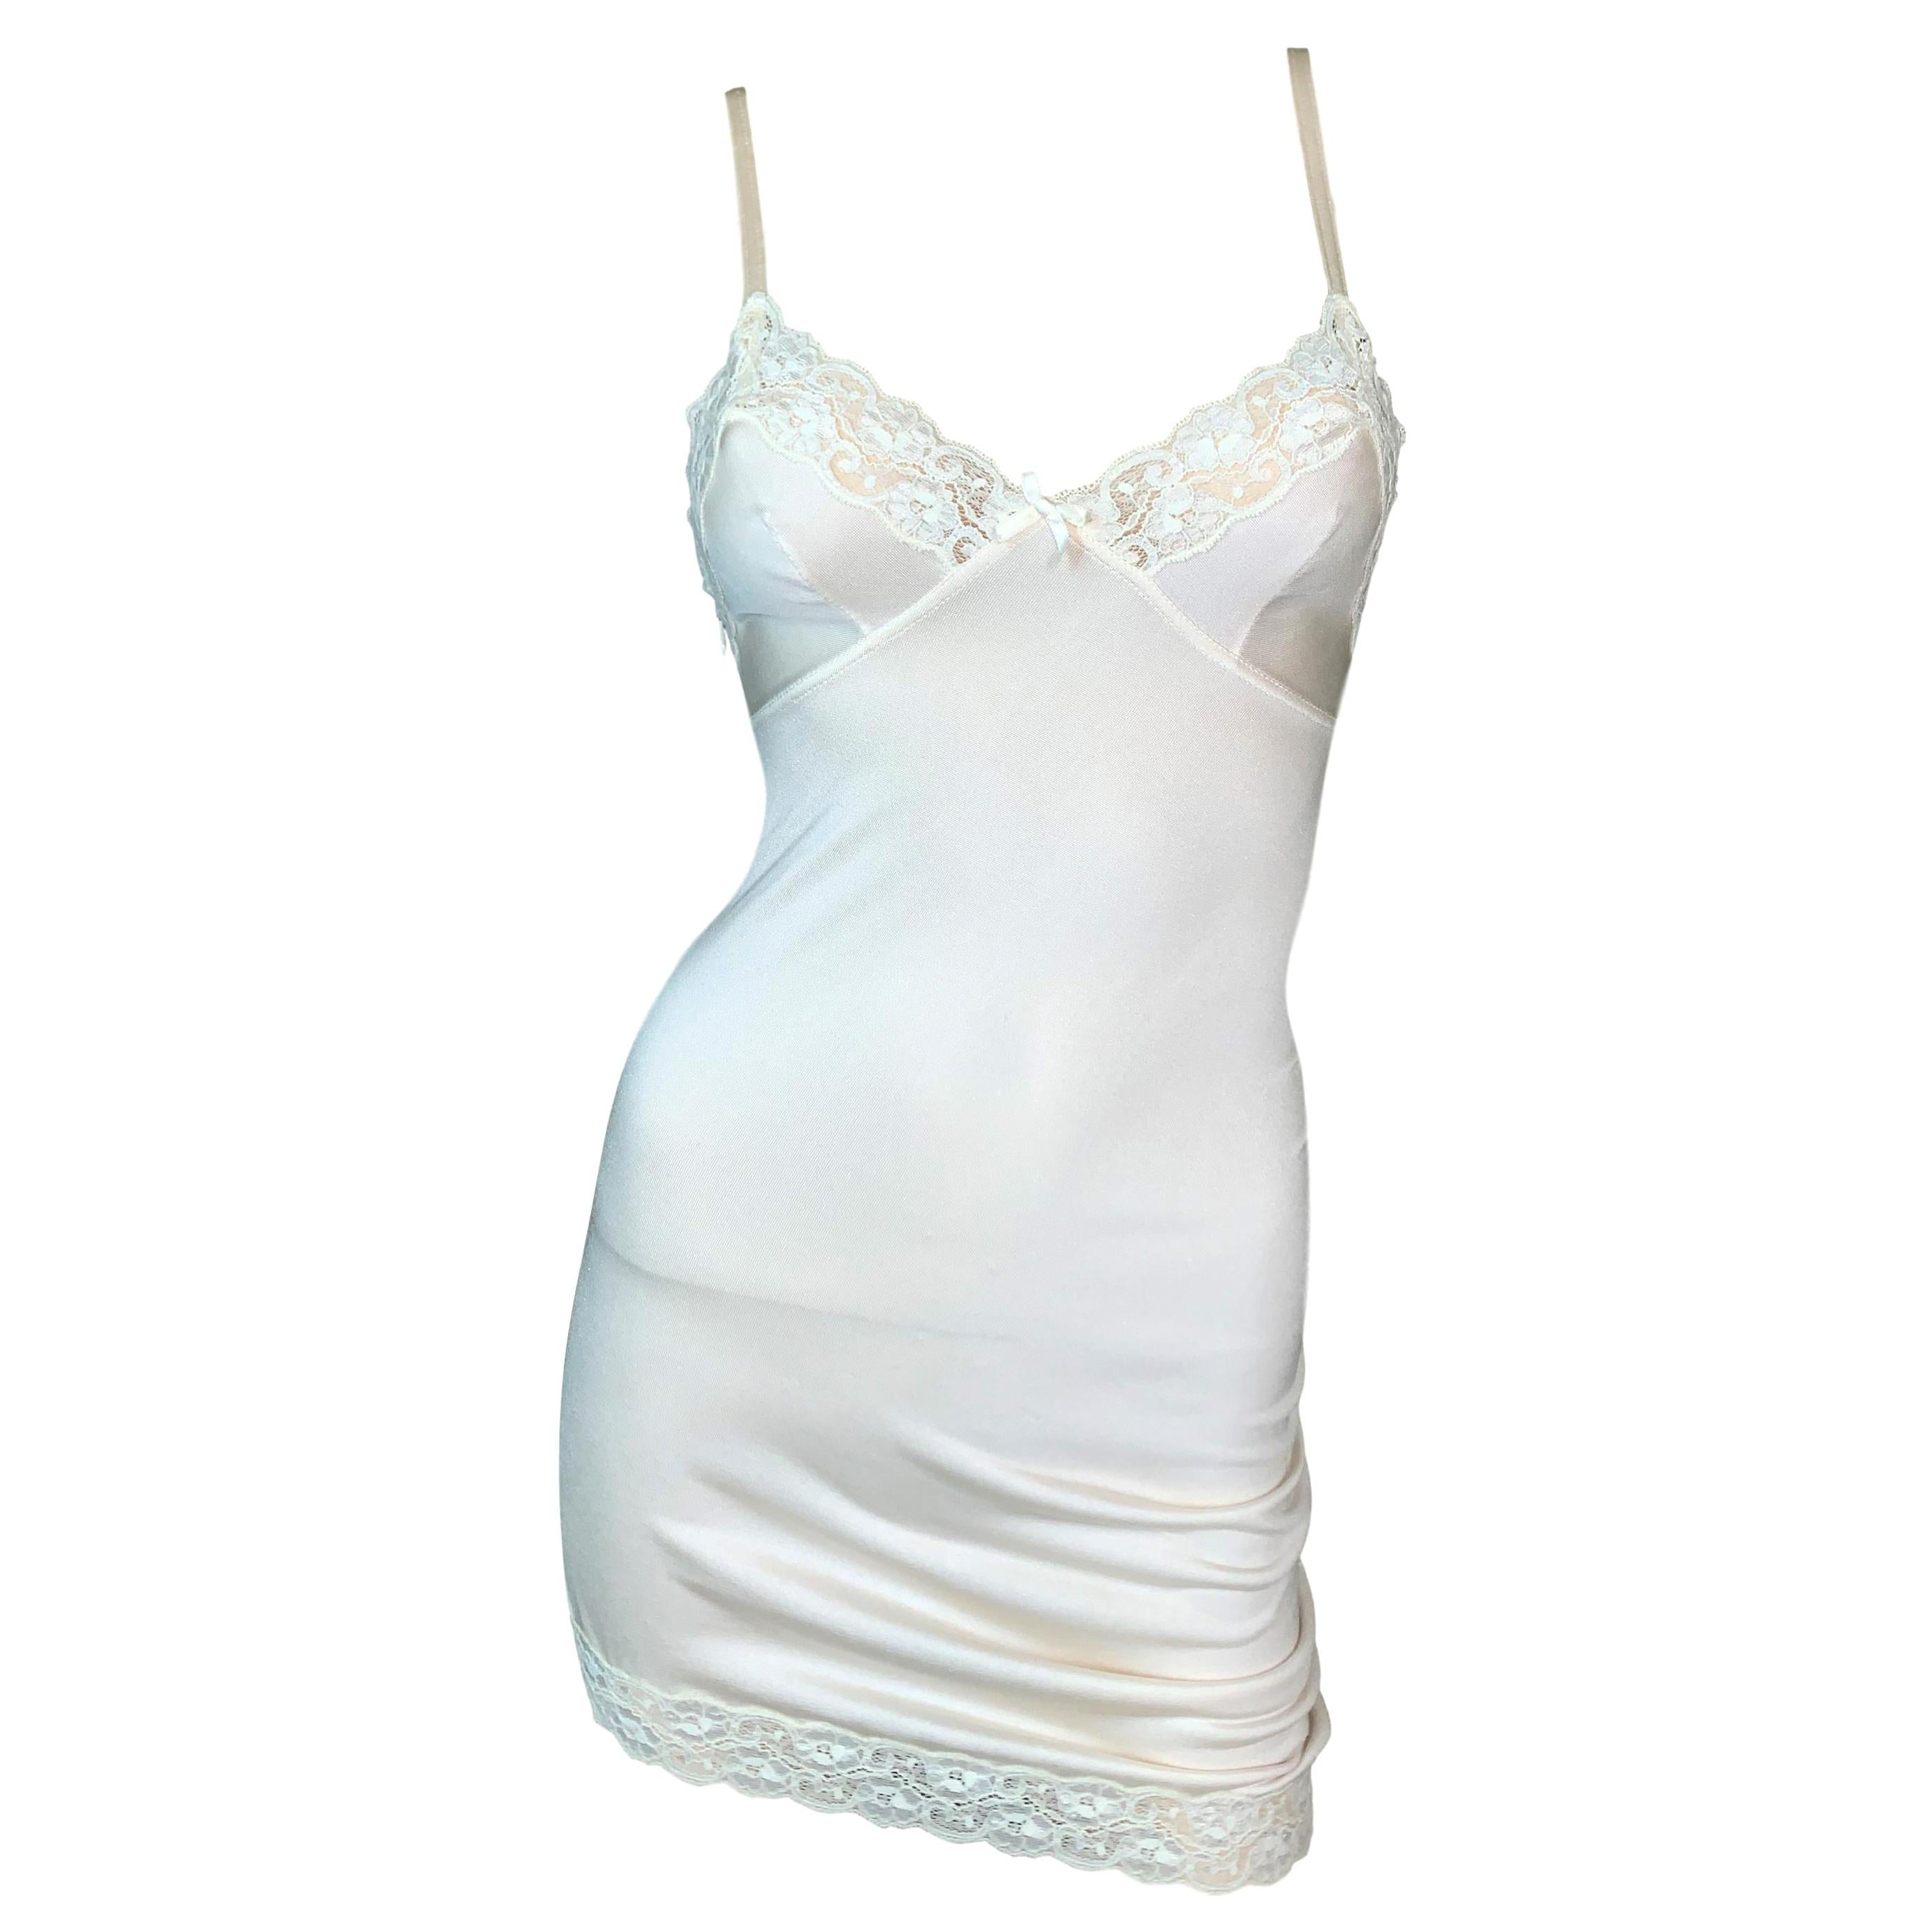 S/S 2005 Christian Dior by John Galliano Runway Ivory Ruched Slip Mini Dress